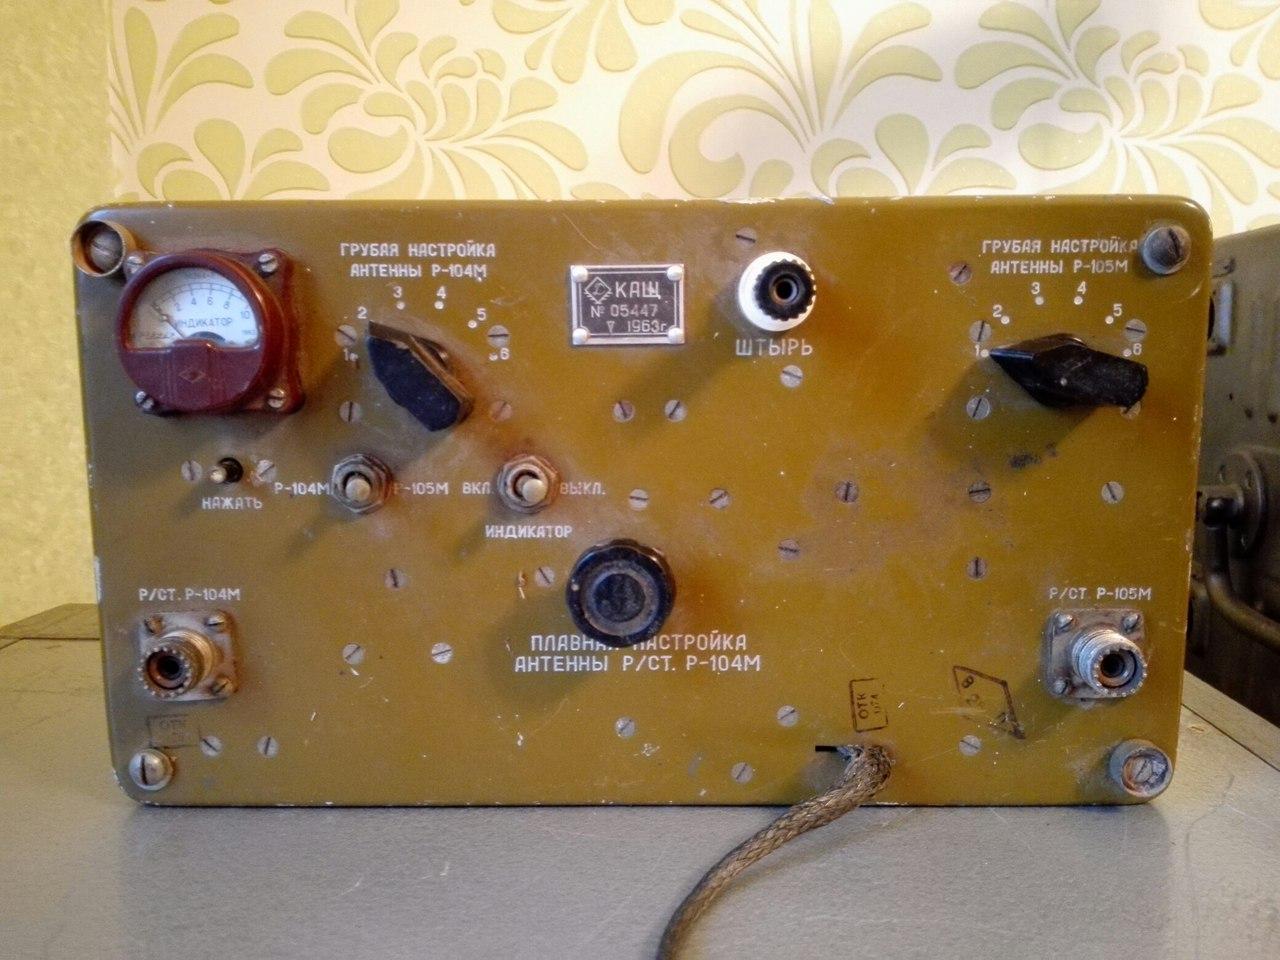 Бп для р-104м imgp1755